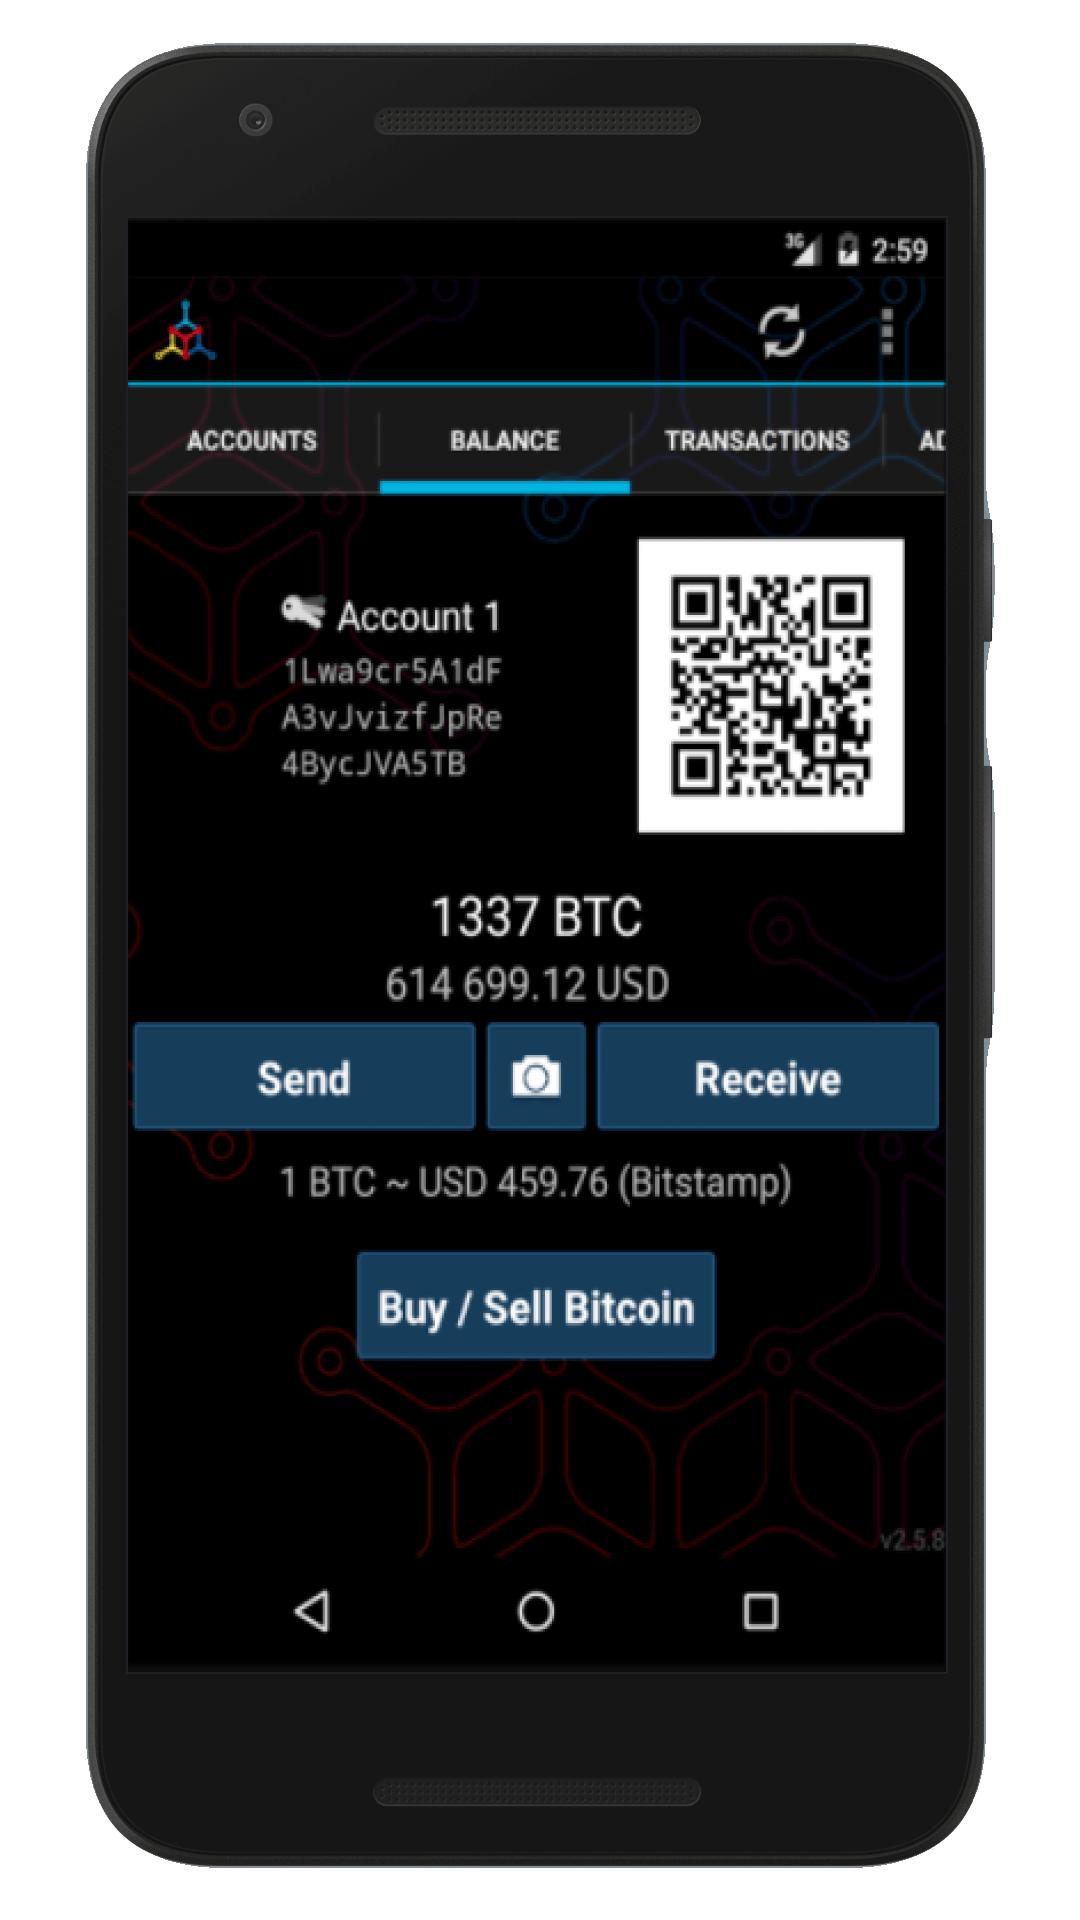 биткоин кошелек скачать на андроид